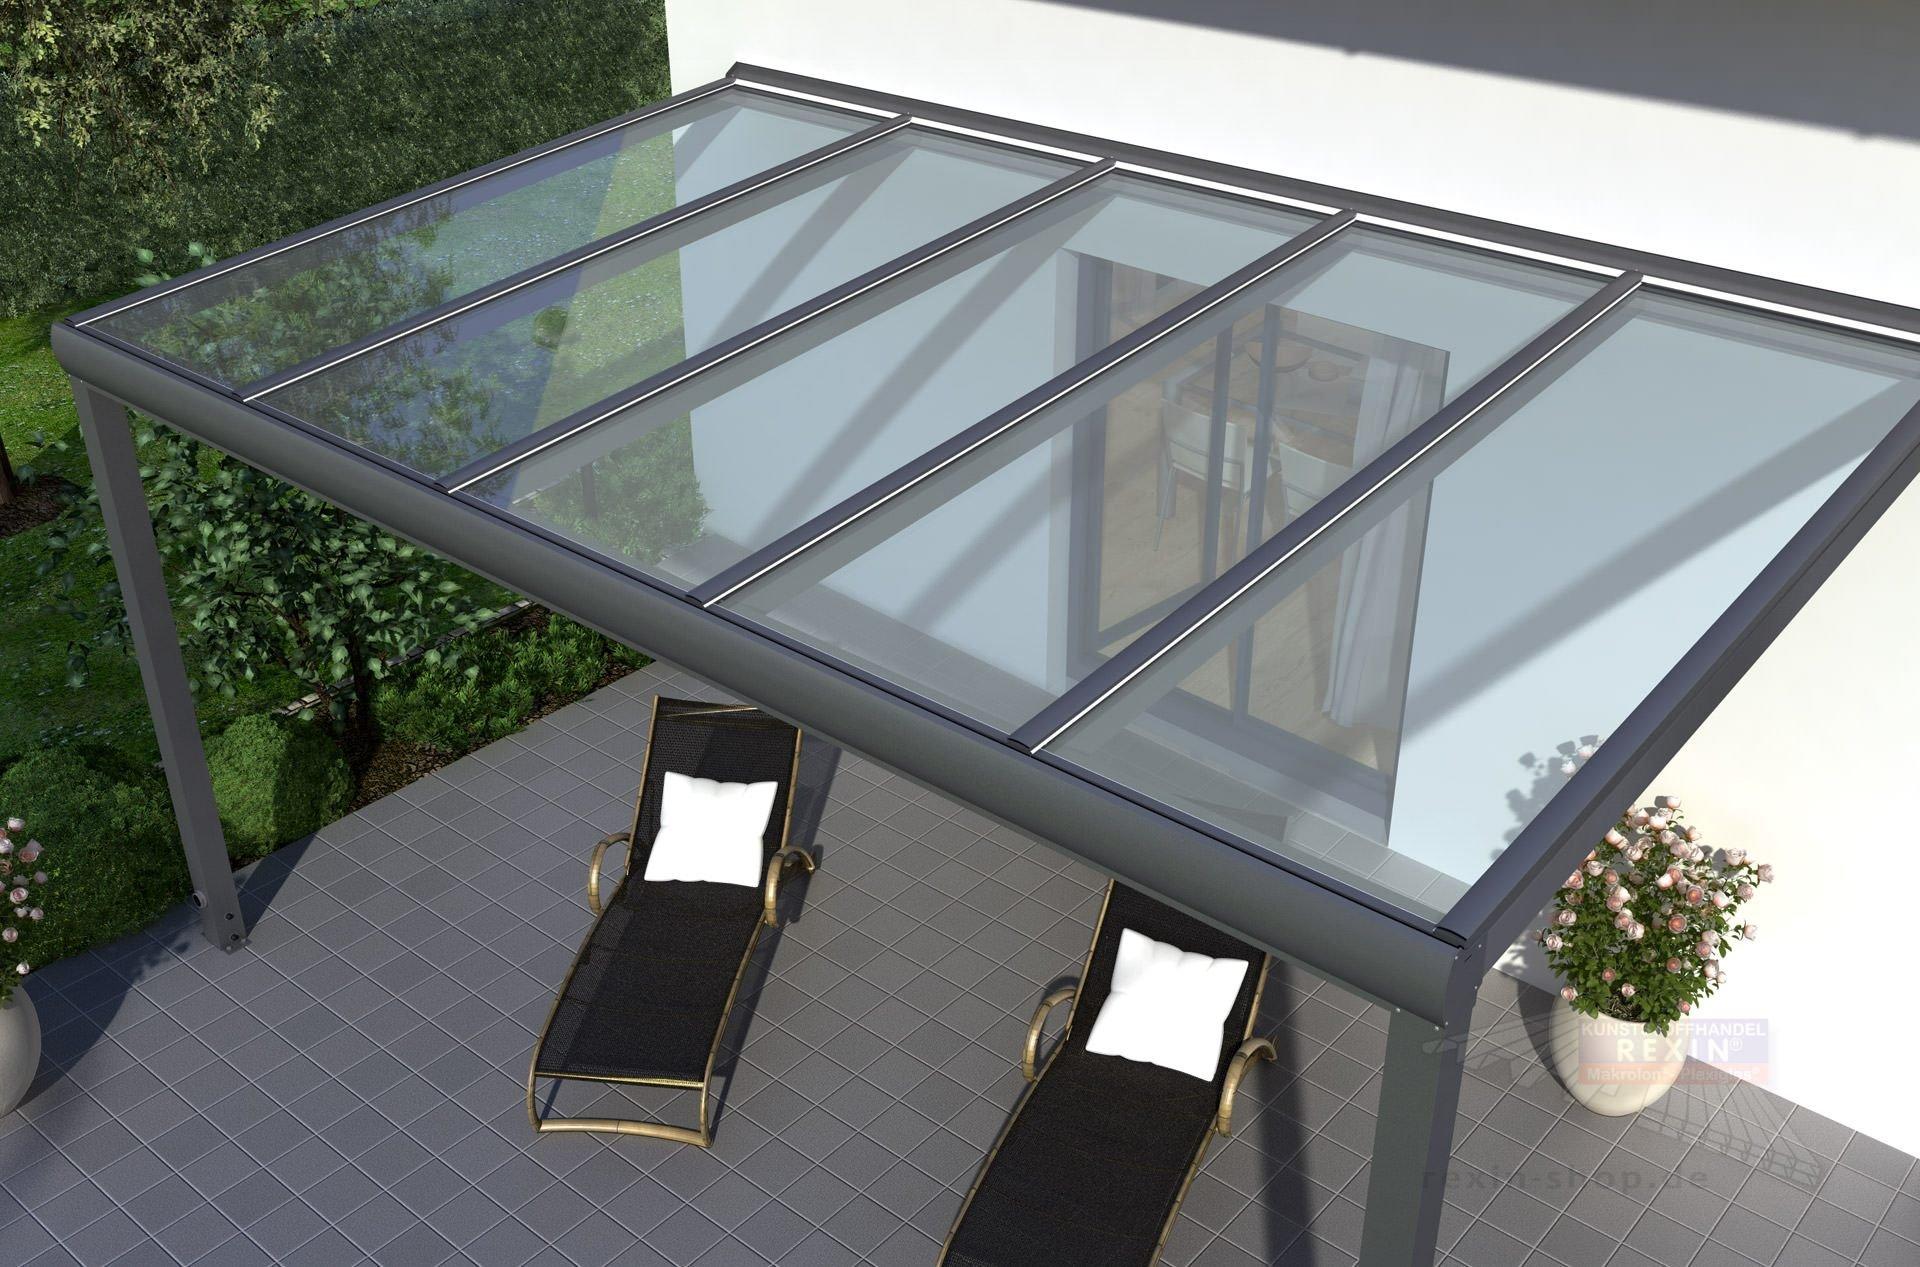 rexopremium alu terrassendach 7m x 3,5m, vsg-glas ▷ rexin-shop, Hause deko